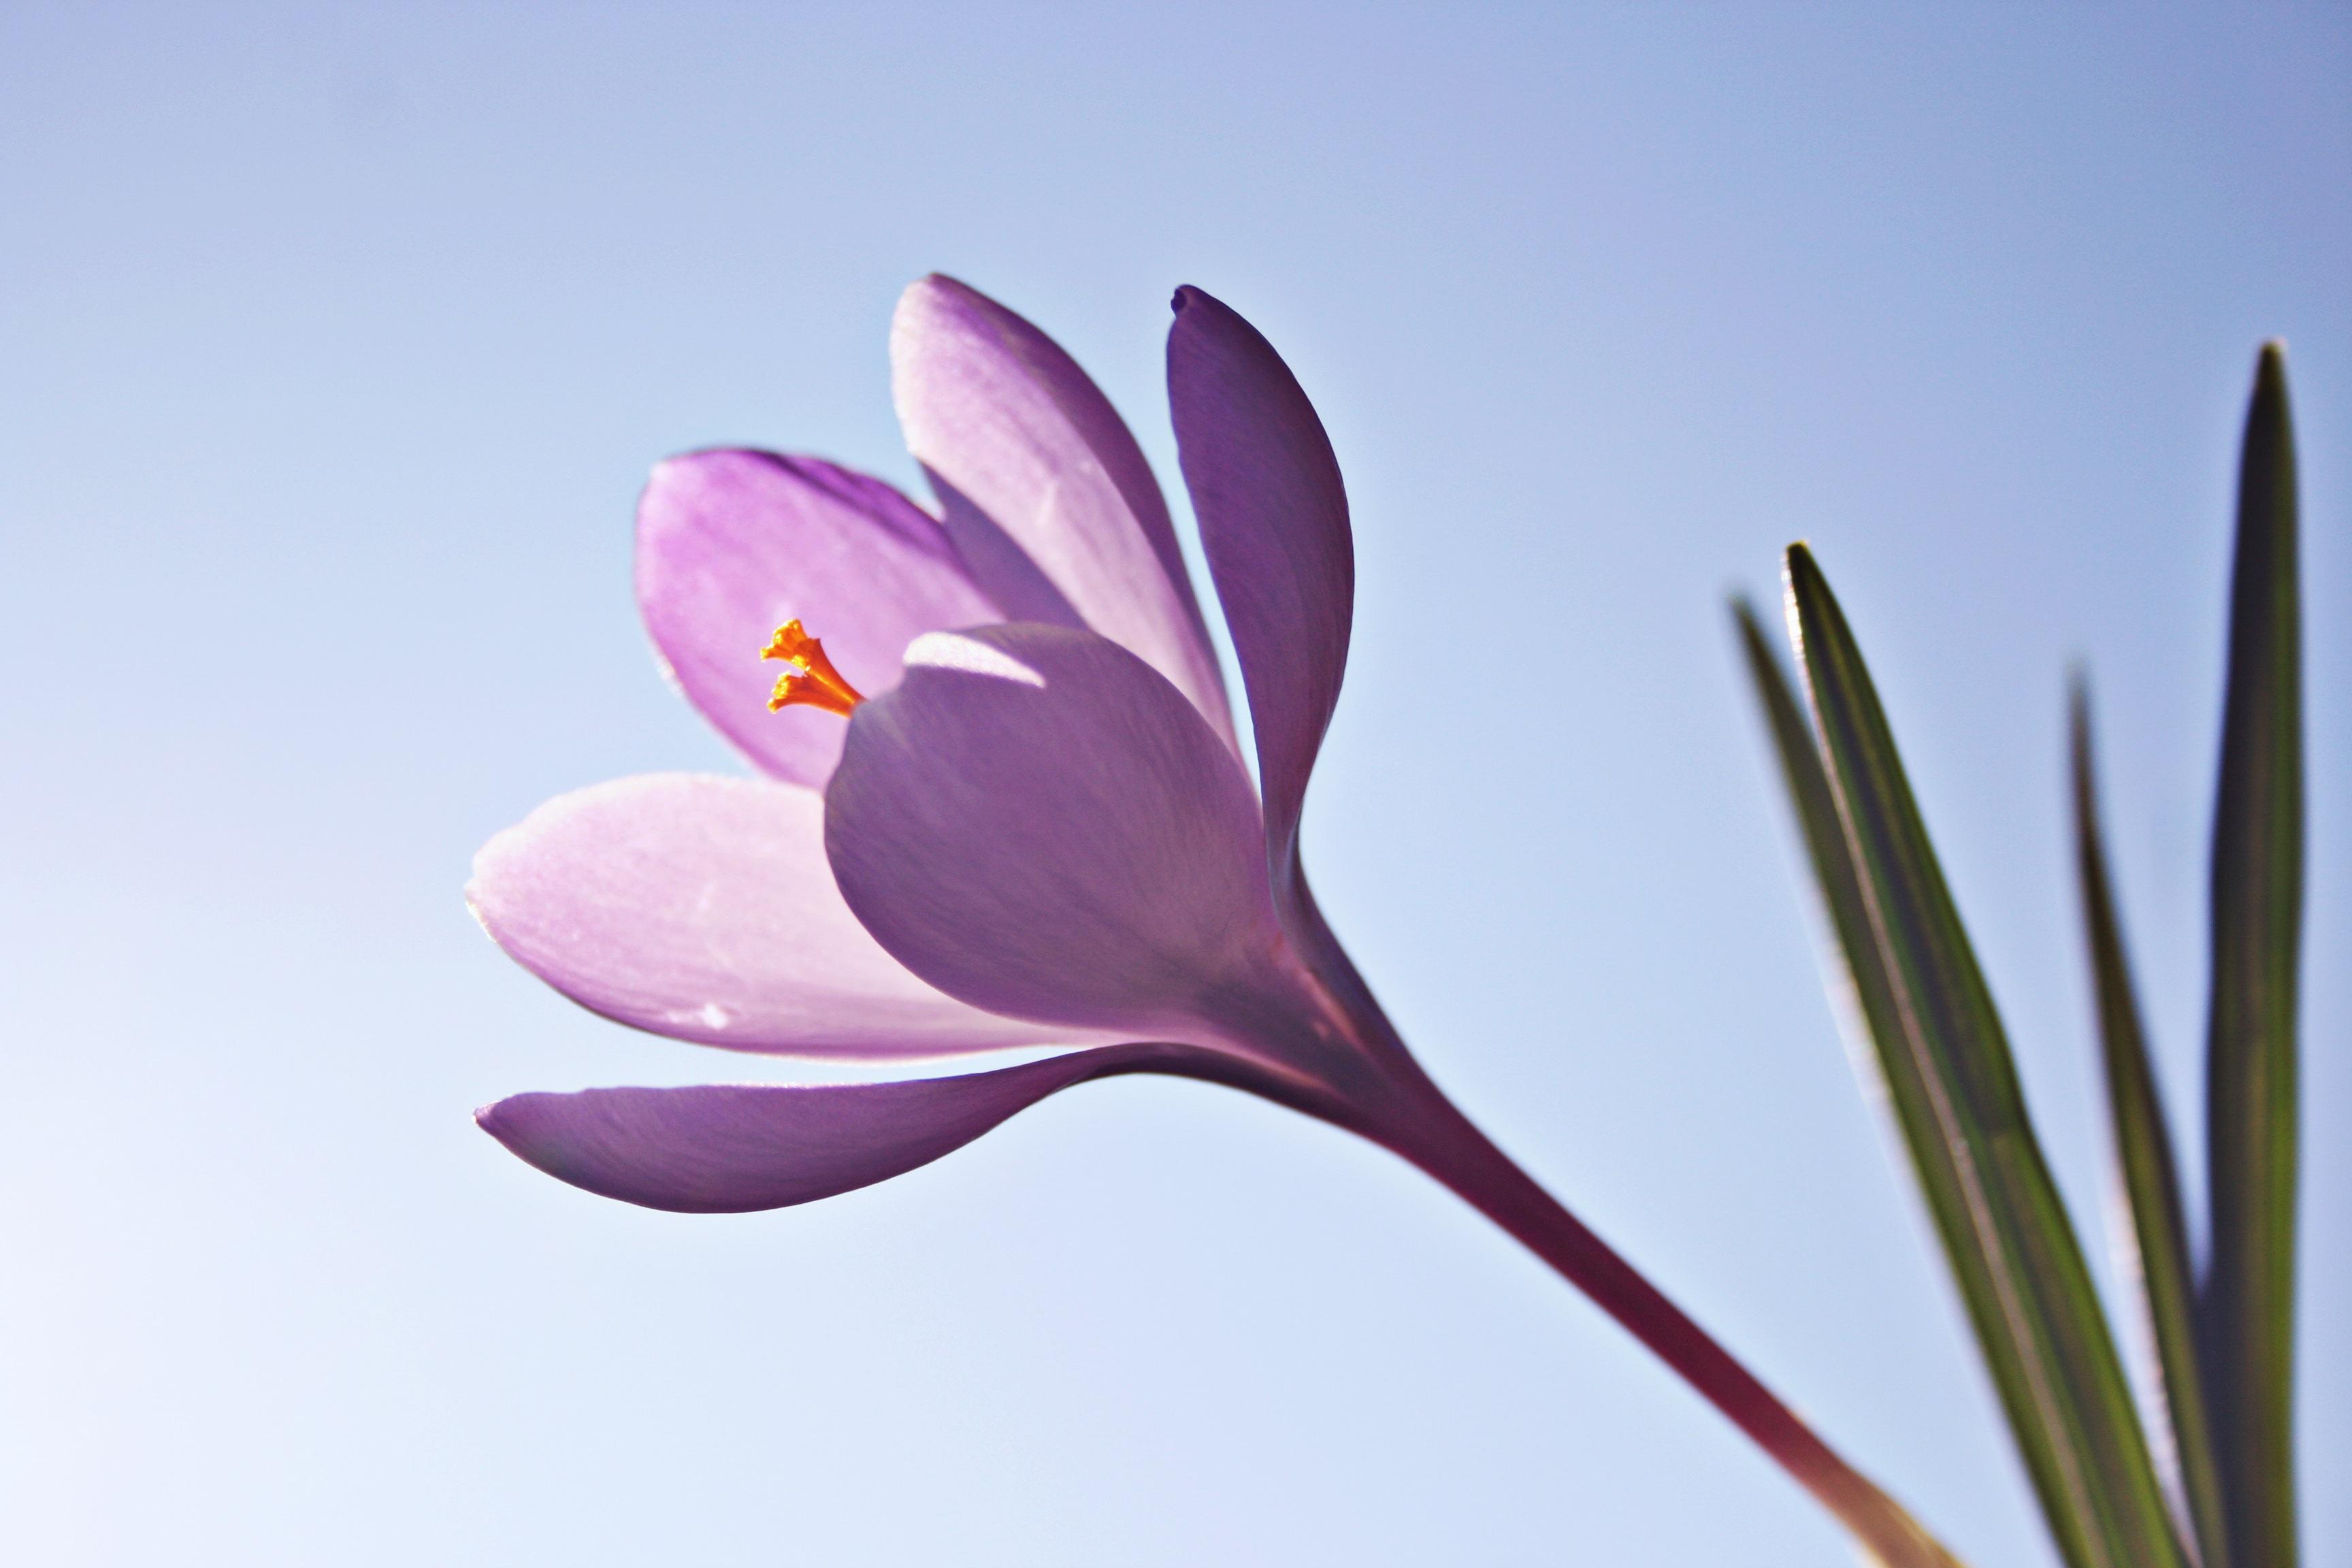 natureza flor plantar folha flor ptala flor primavera botnica jardim rosa flora flores fecharse